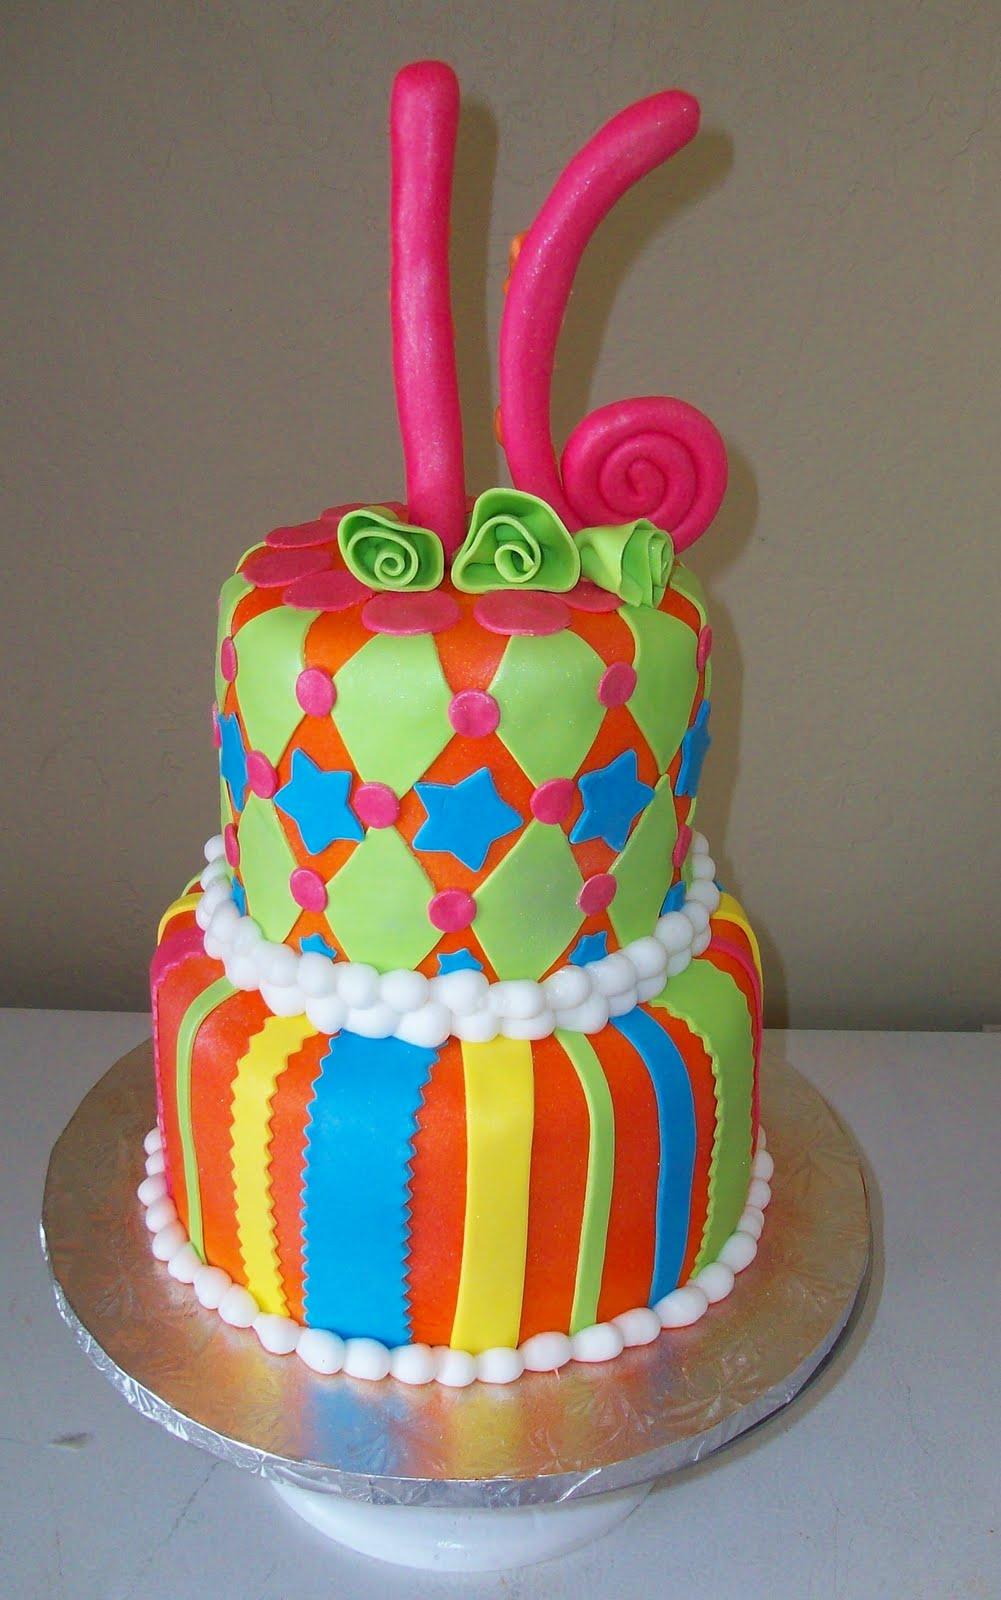 fondant tiered cakes